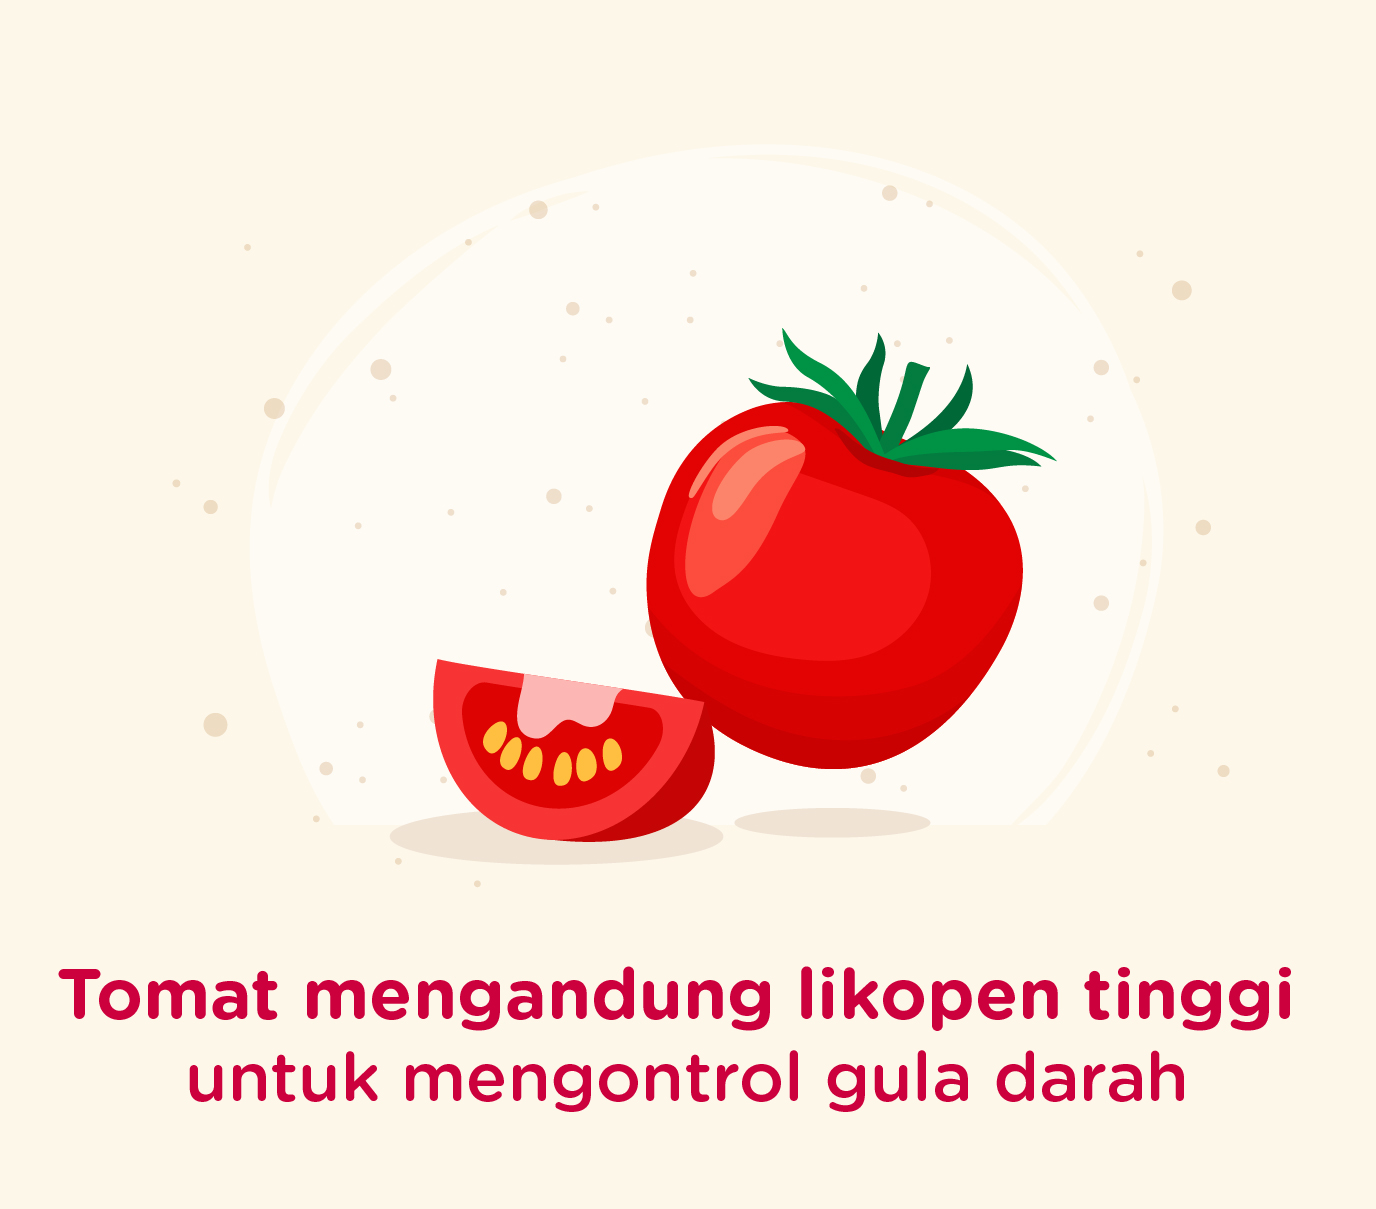 Tomat mengandung likopen tinggi untuk mengontrol gula darah